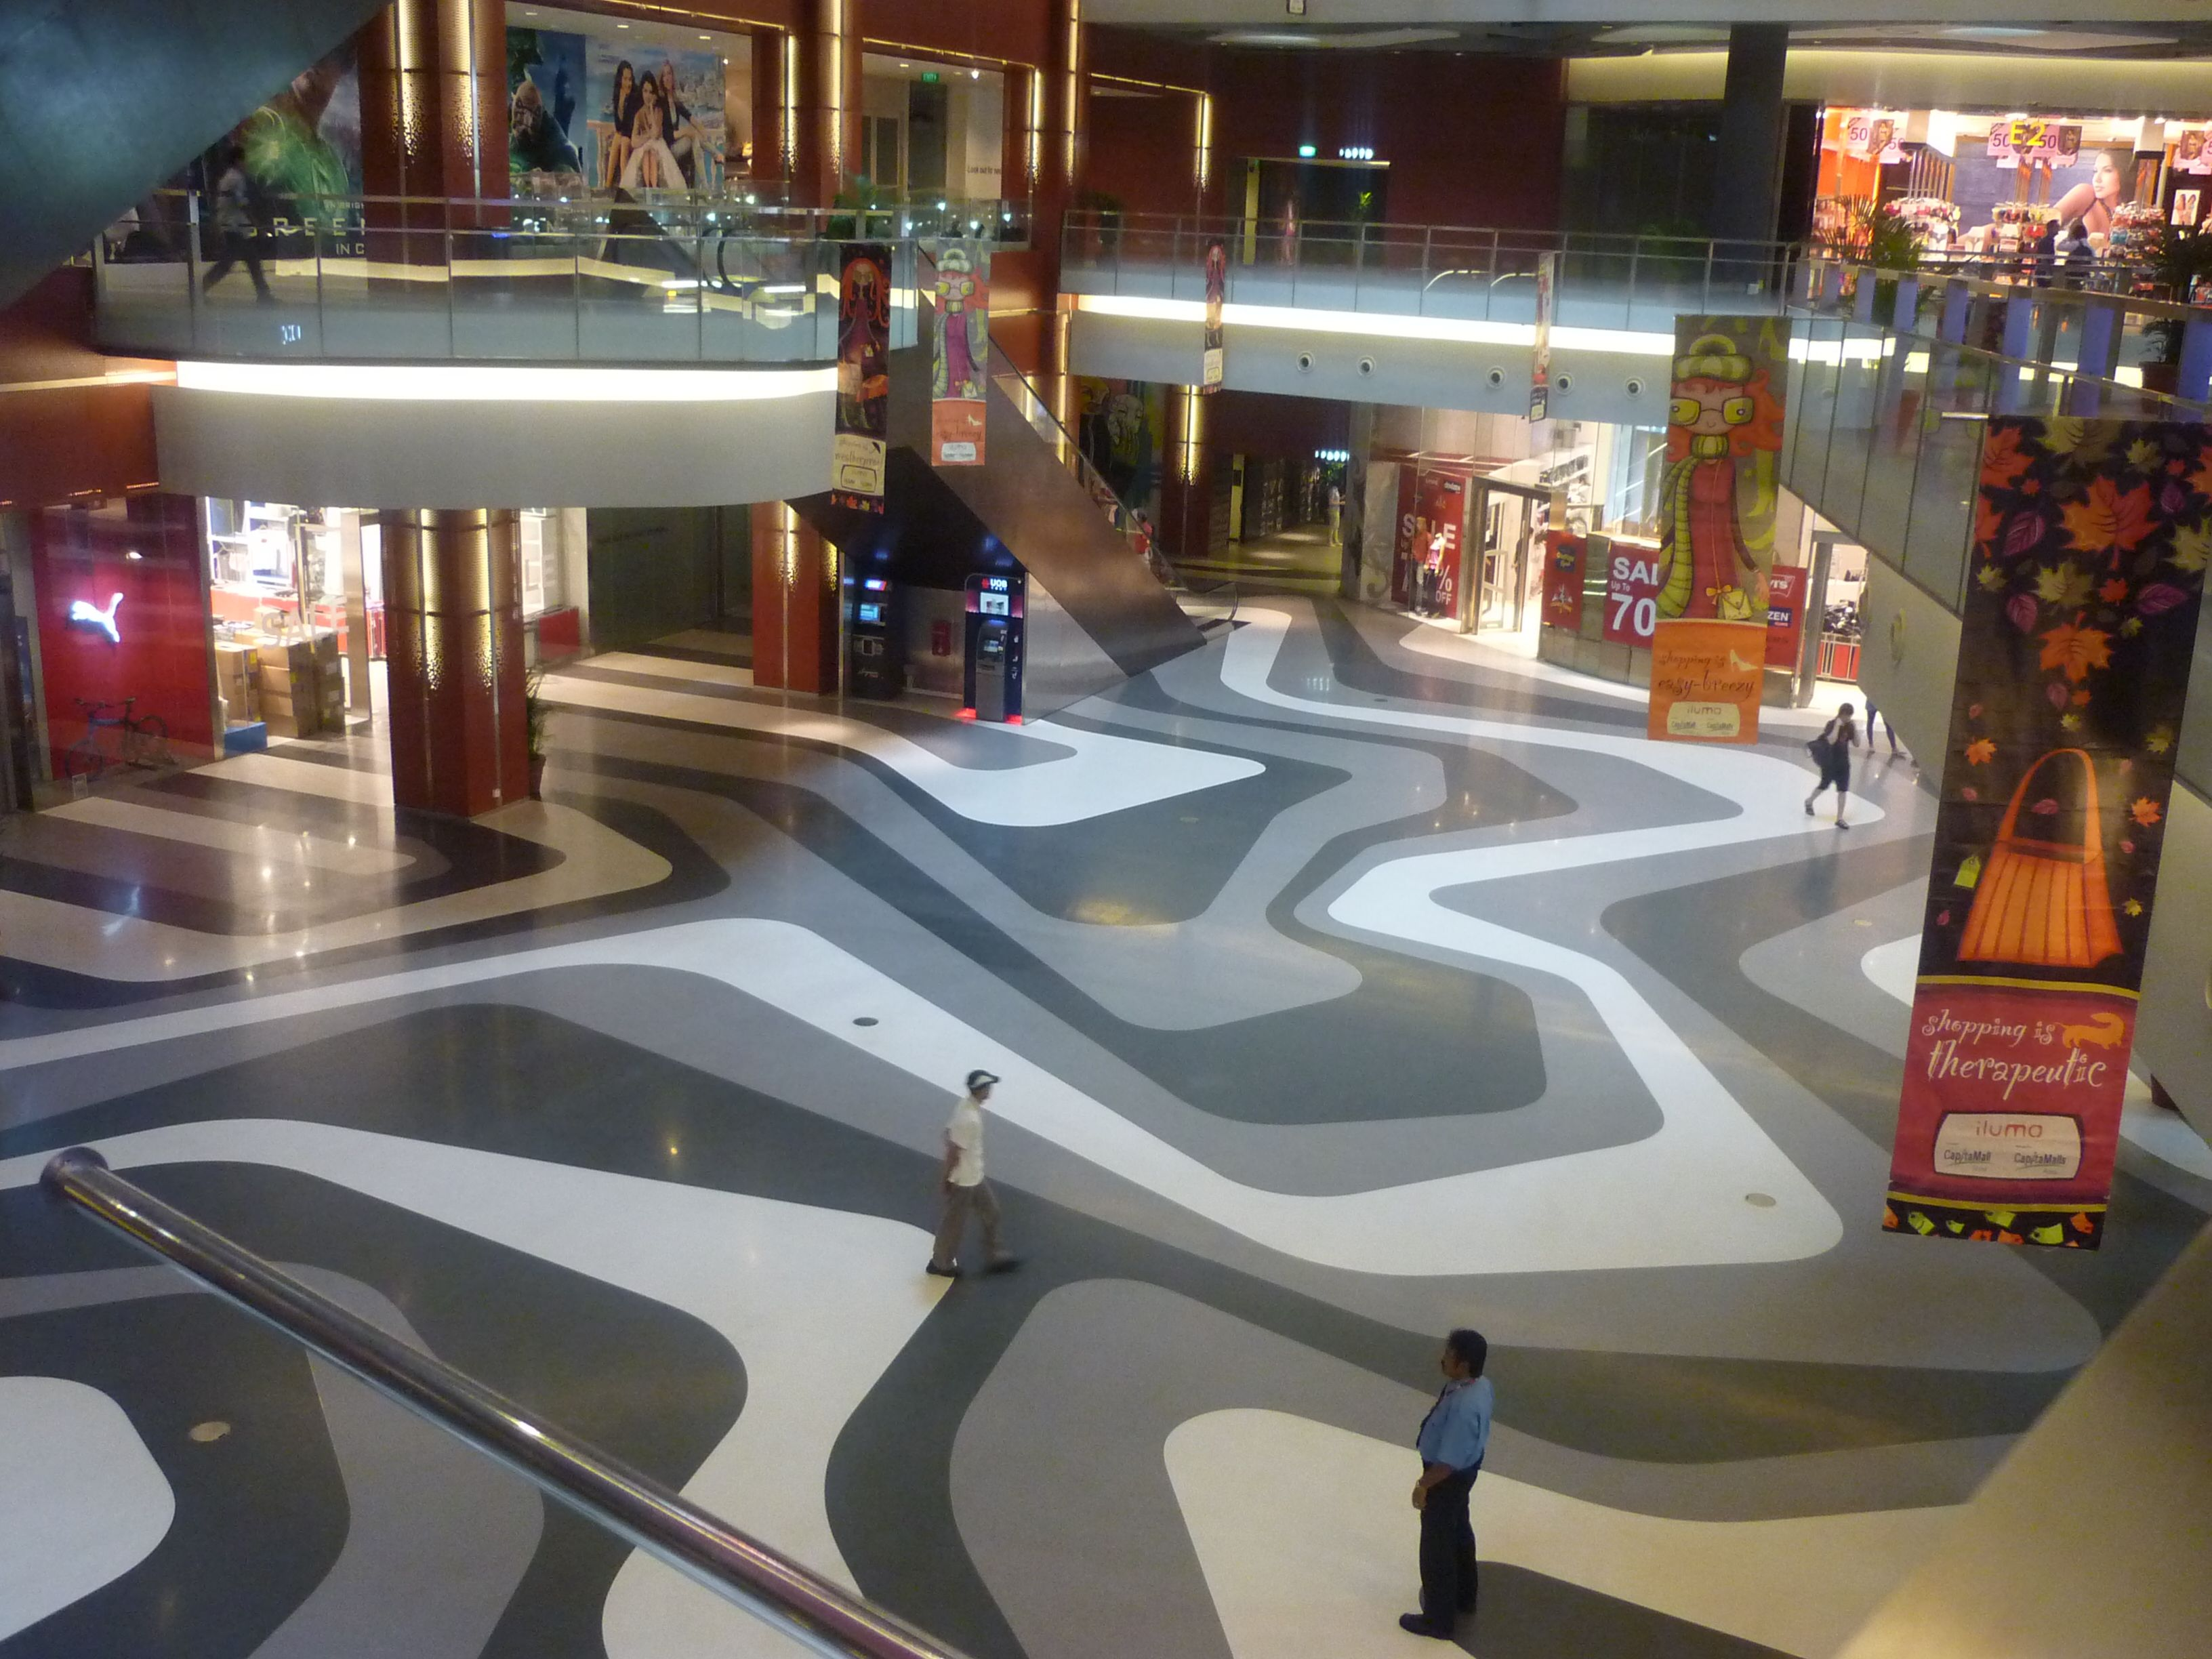 Iluma Mall Singapore Retail Design Interior Architecture Floor Pattern Mytrip 2011 Myownpic Retail Design Flooring Inspiration Rubber Flooring